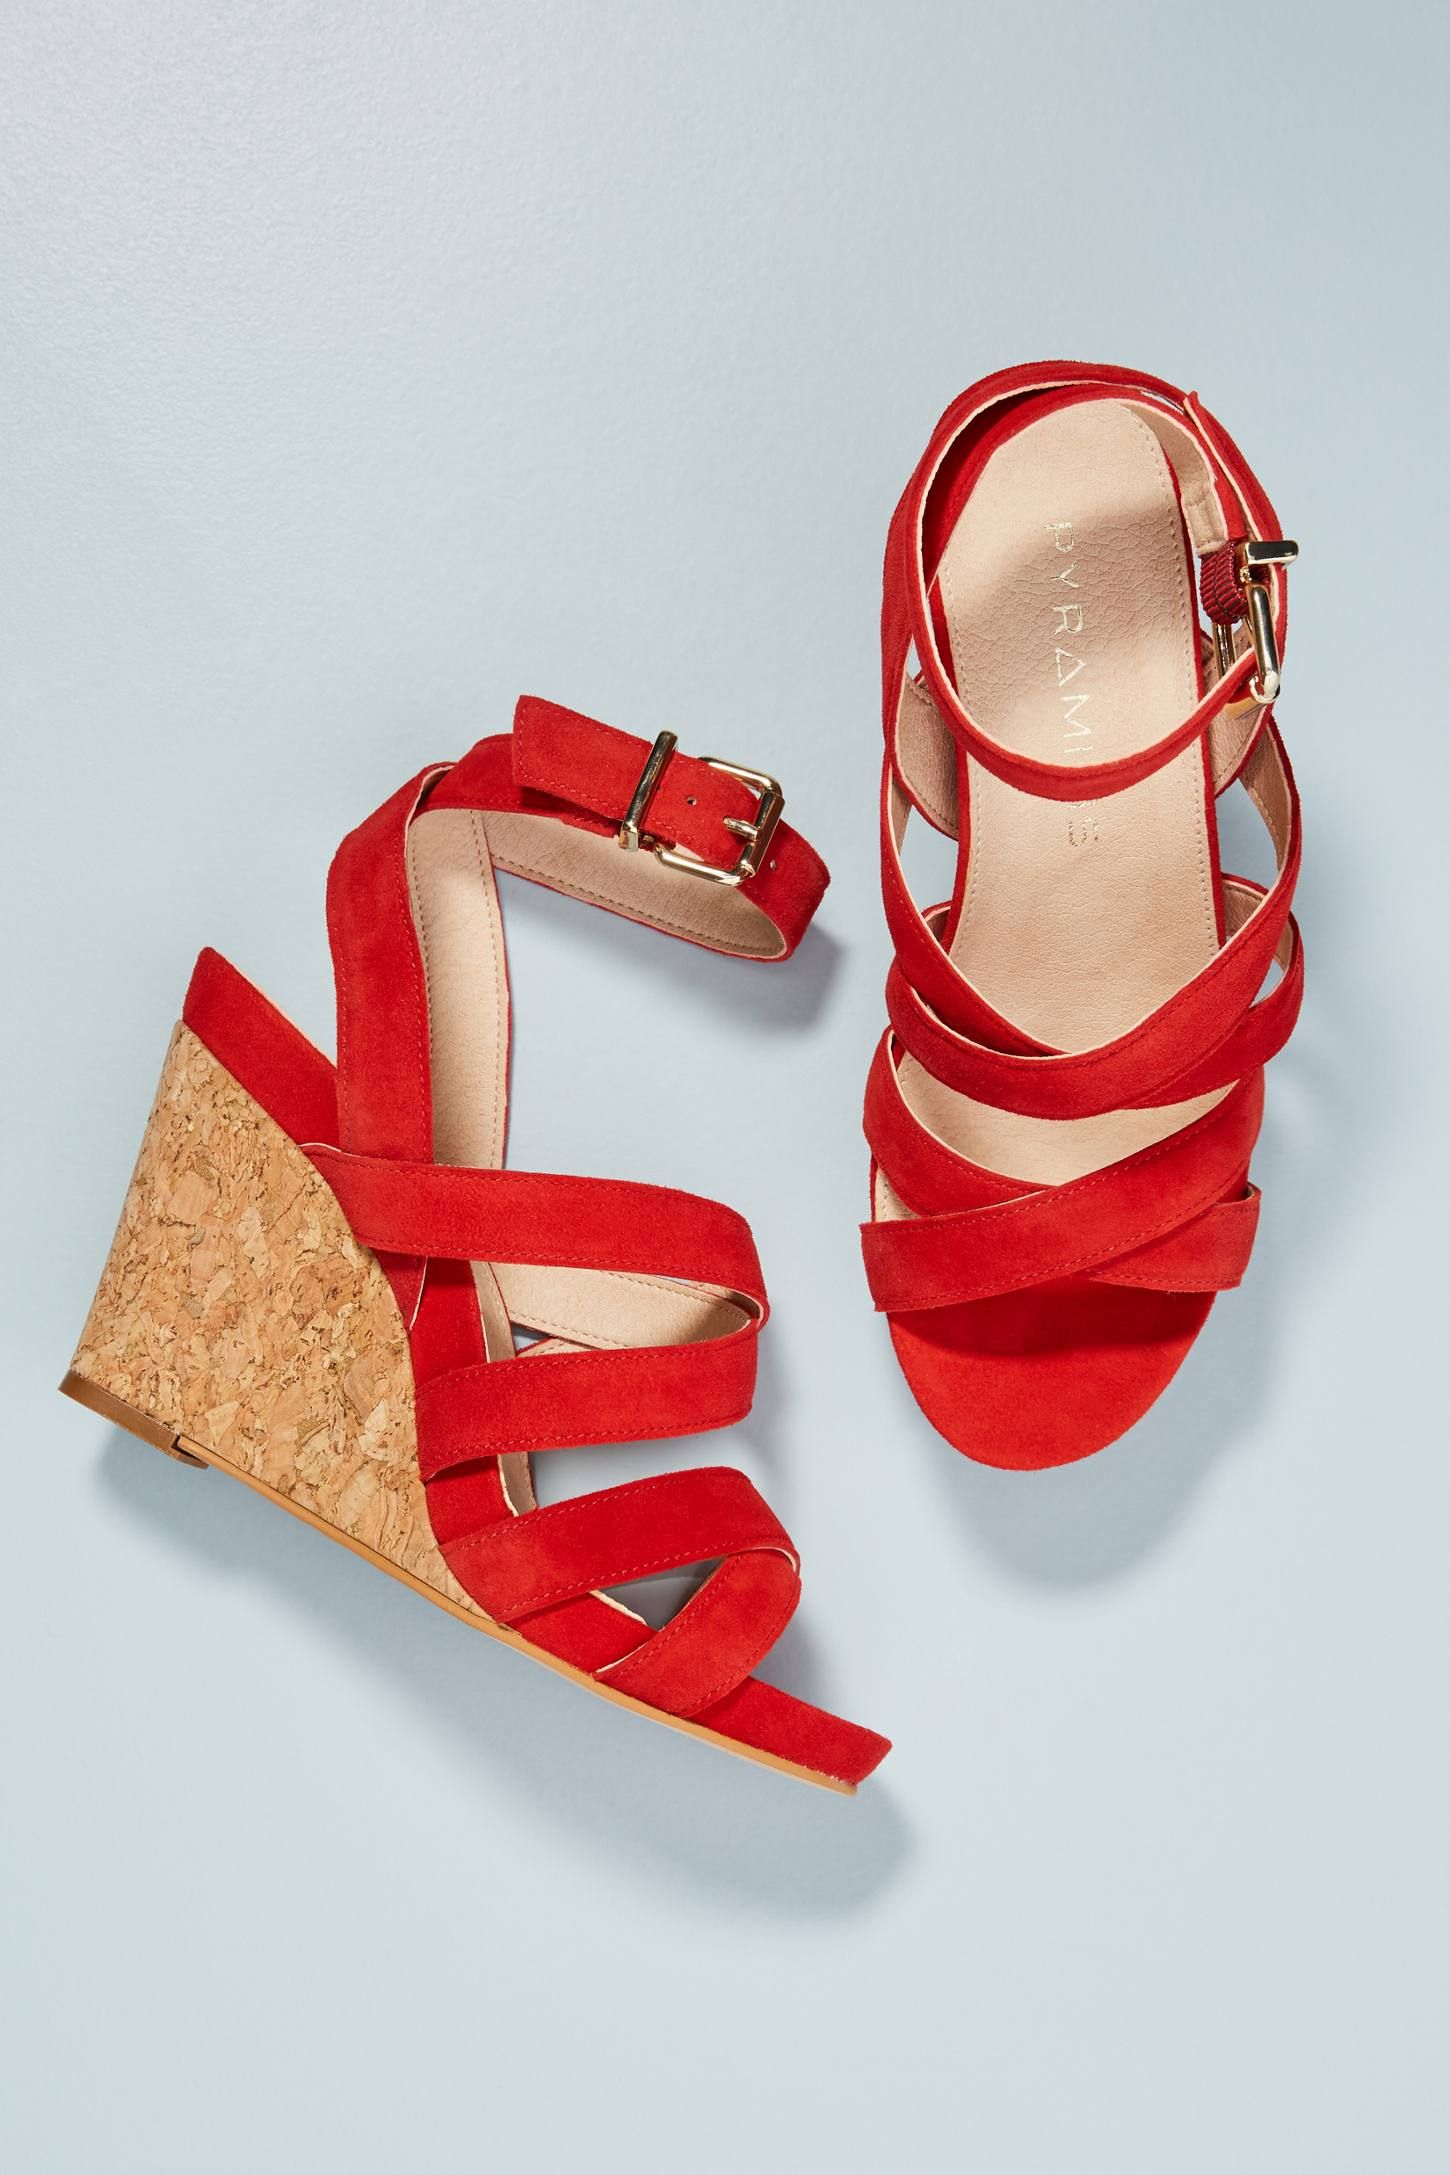 Wedge Crossed Strap Shoes Pyramidis SandalsShoesGlorious 8OZNkwn0XP